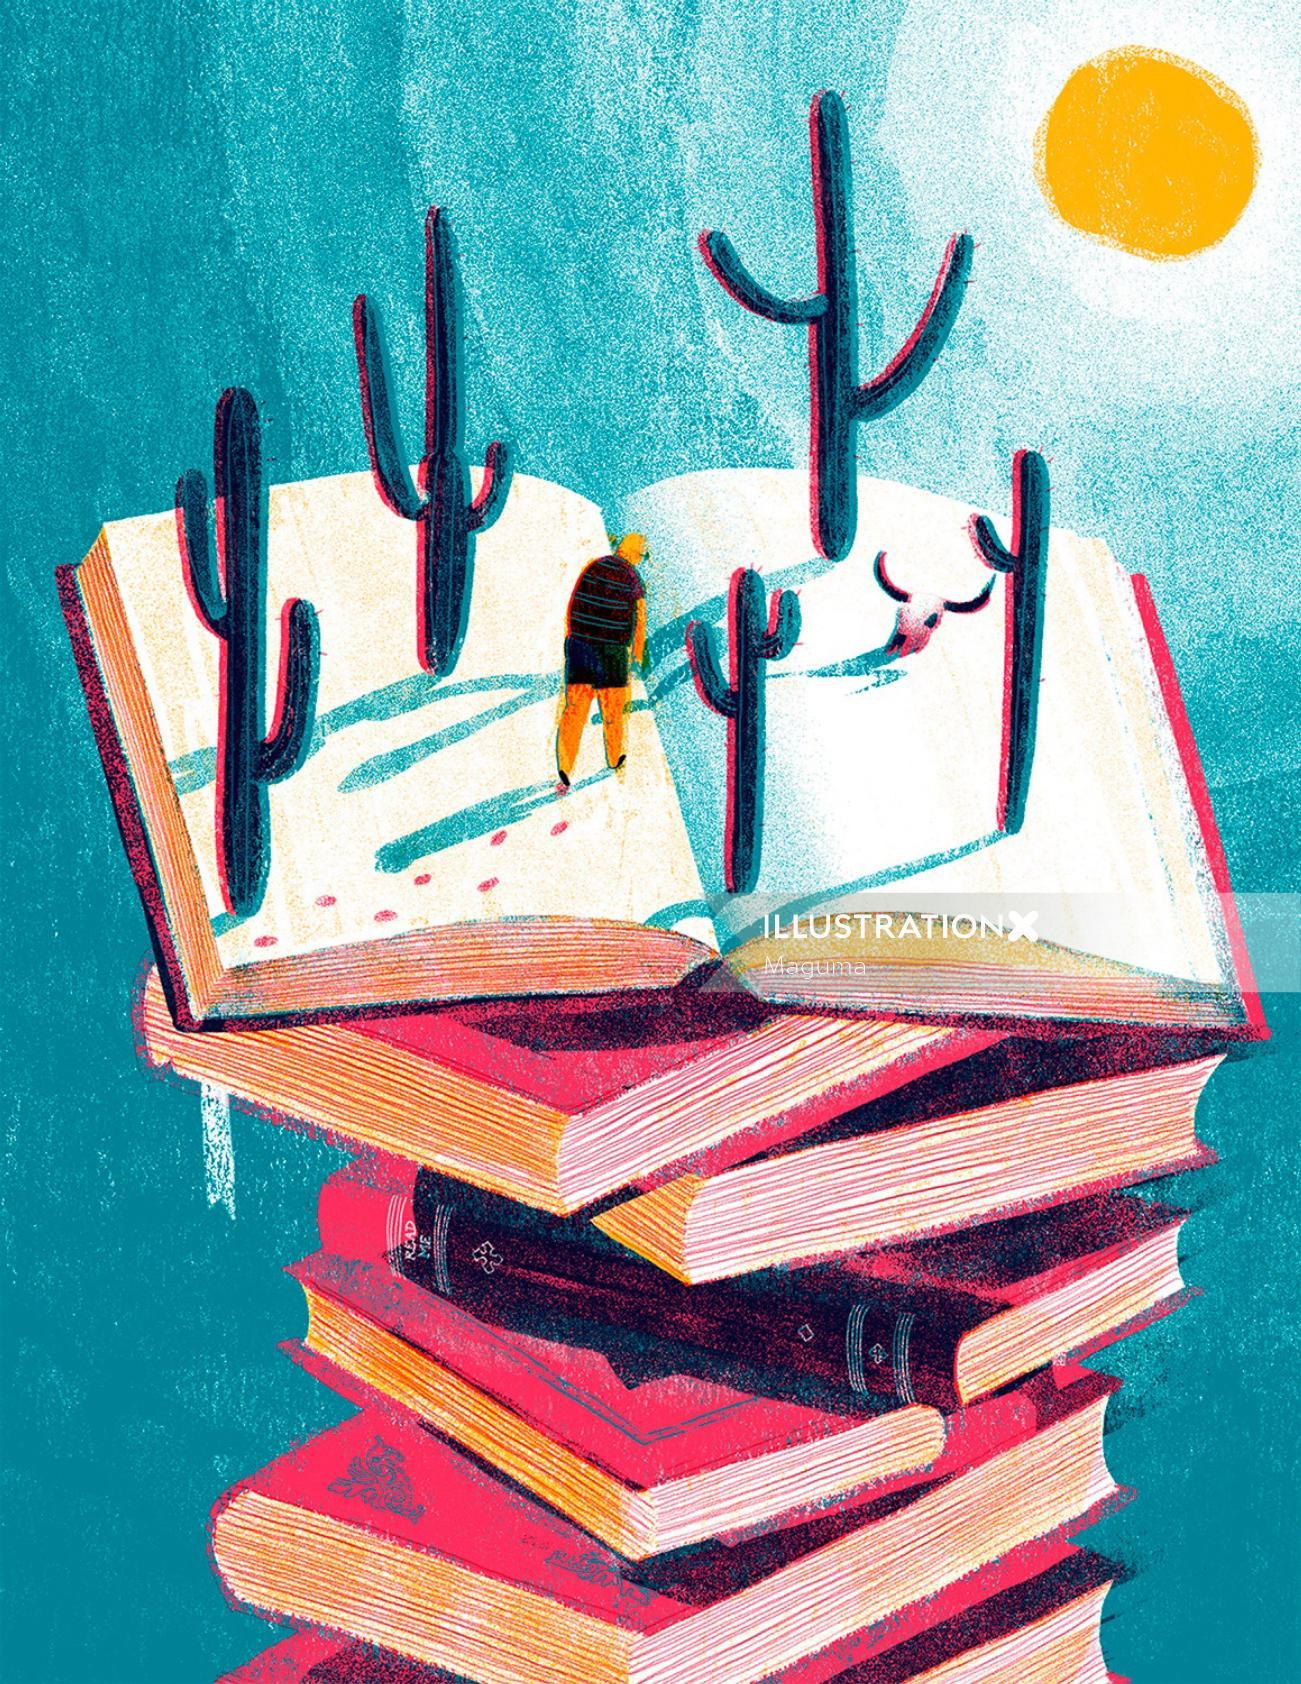 Conceptual Too many books